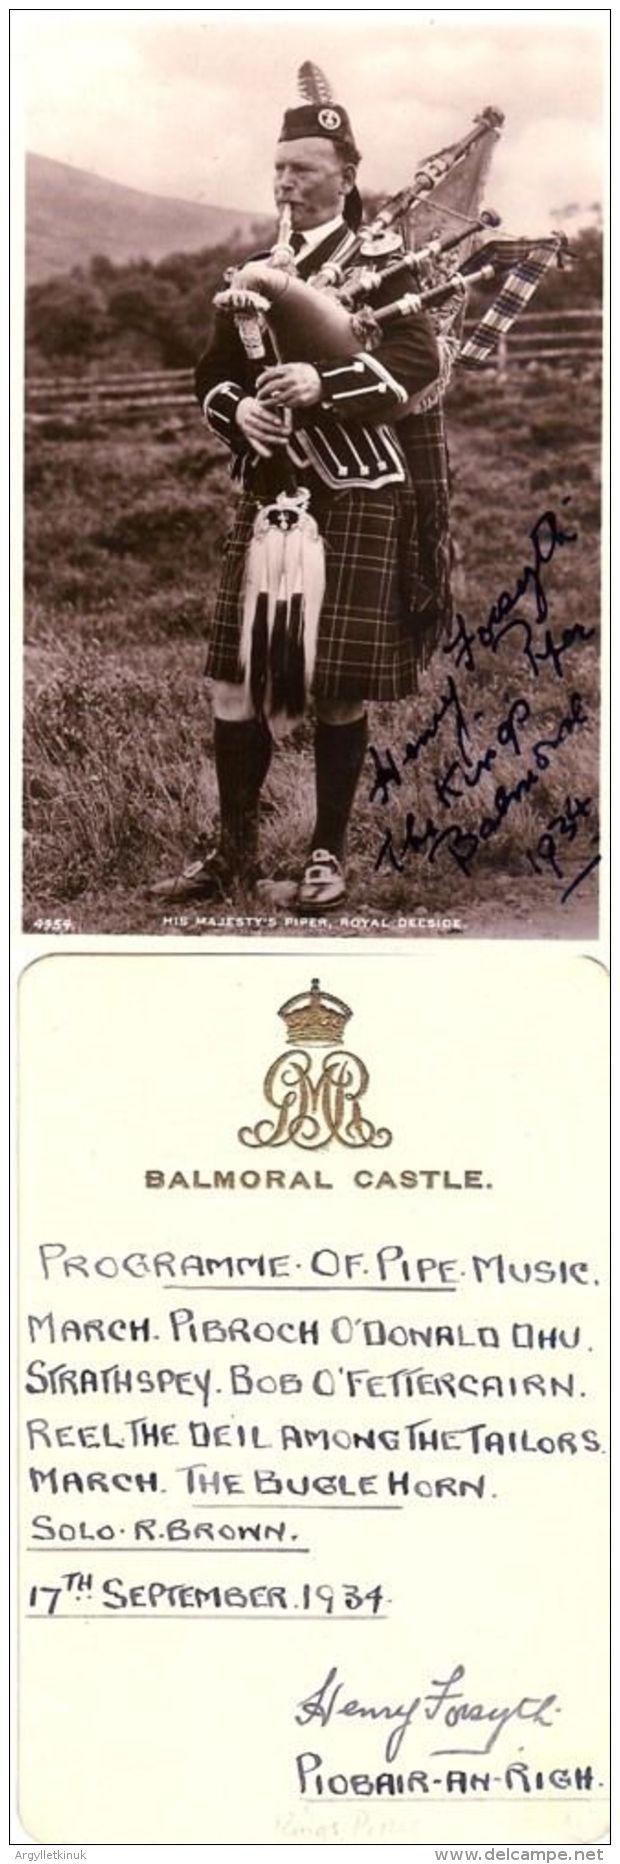 RARE SIGNED BALMORAL CASTLE PROGRAMME & POSTCARD SCOTS PIPE MAJOR H FORSYTH 1934 - Autographs